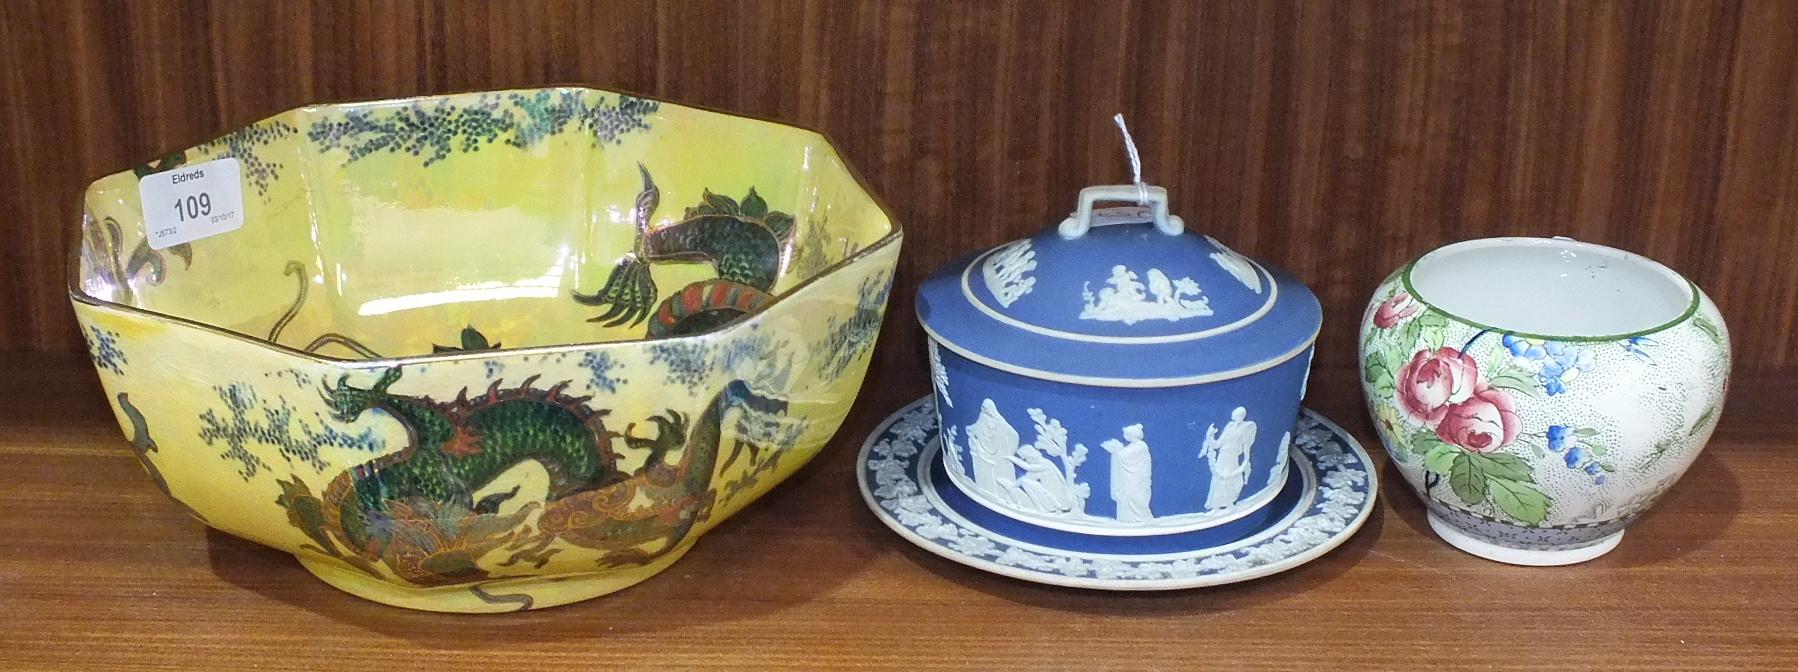 Lot 109 - A Bursley Ltd 'Dragon' decorated octagonal-shaped yellow lustre bowl, 23cm diameter, 9cm high, a